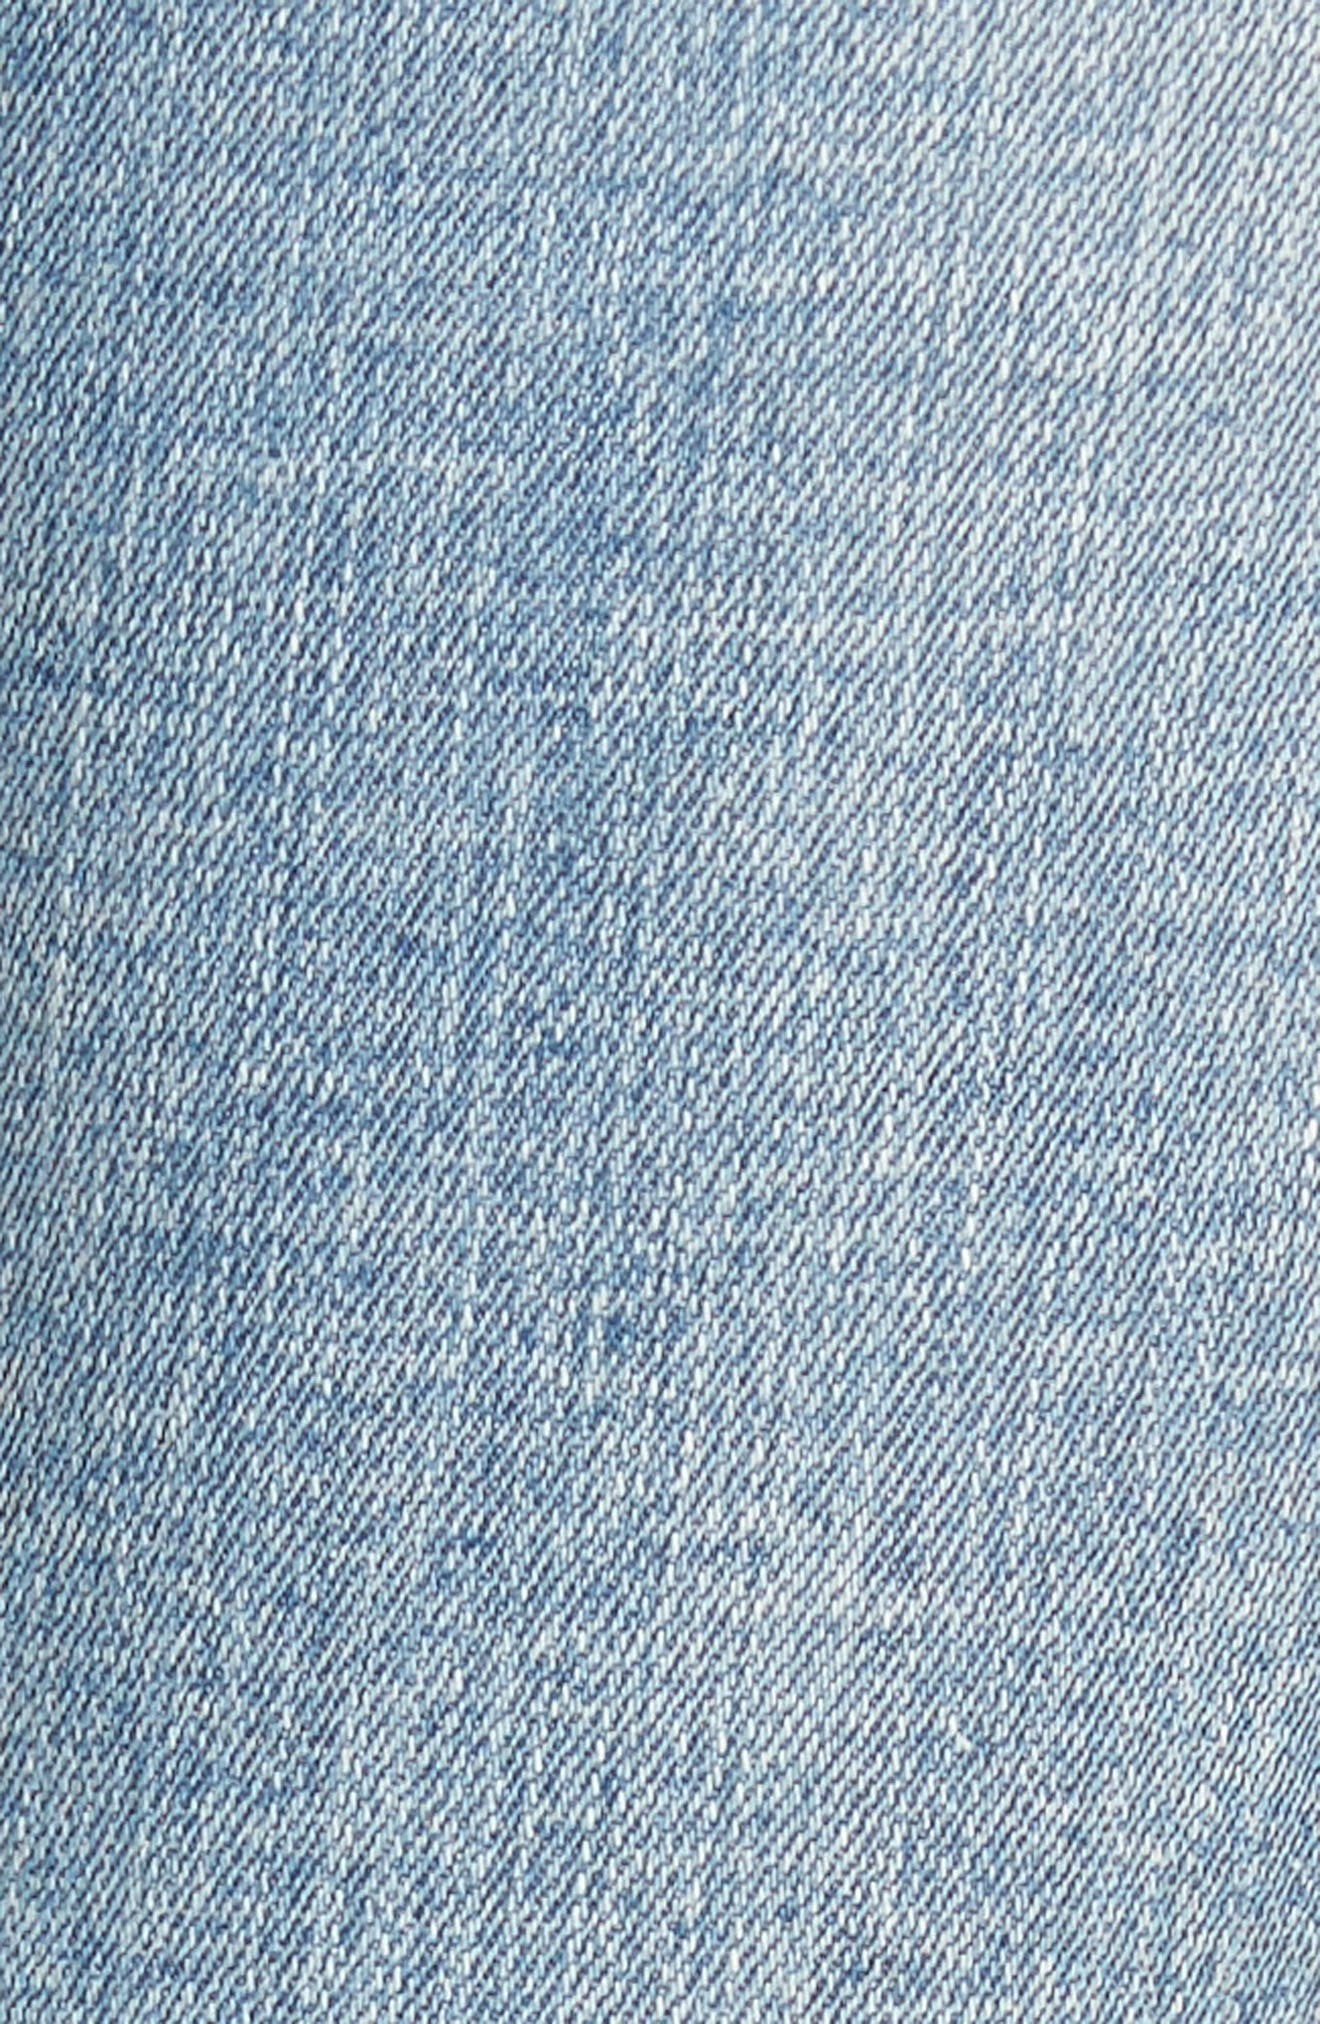 Ripped Knee Skinny Jeans,                             Alternate thumbnail 6, color,                             MEDIUM LIGHT